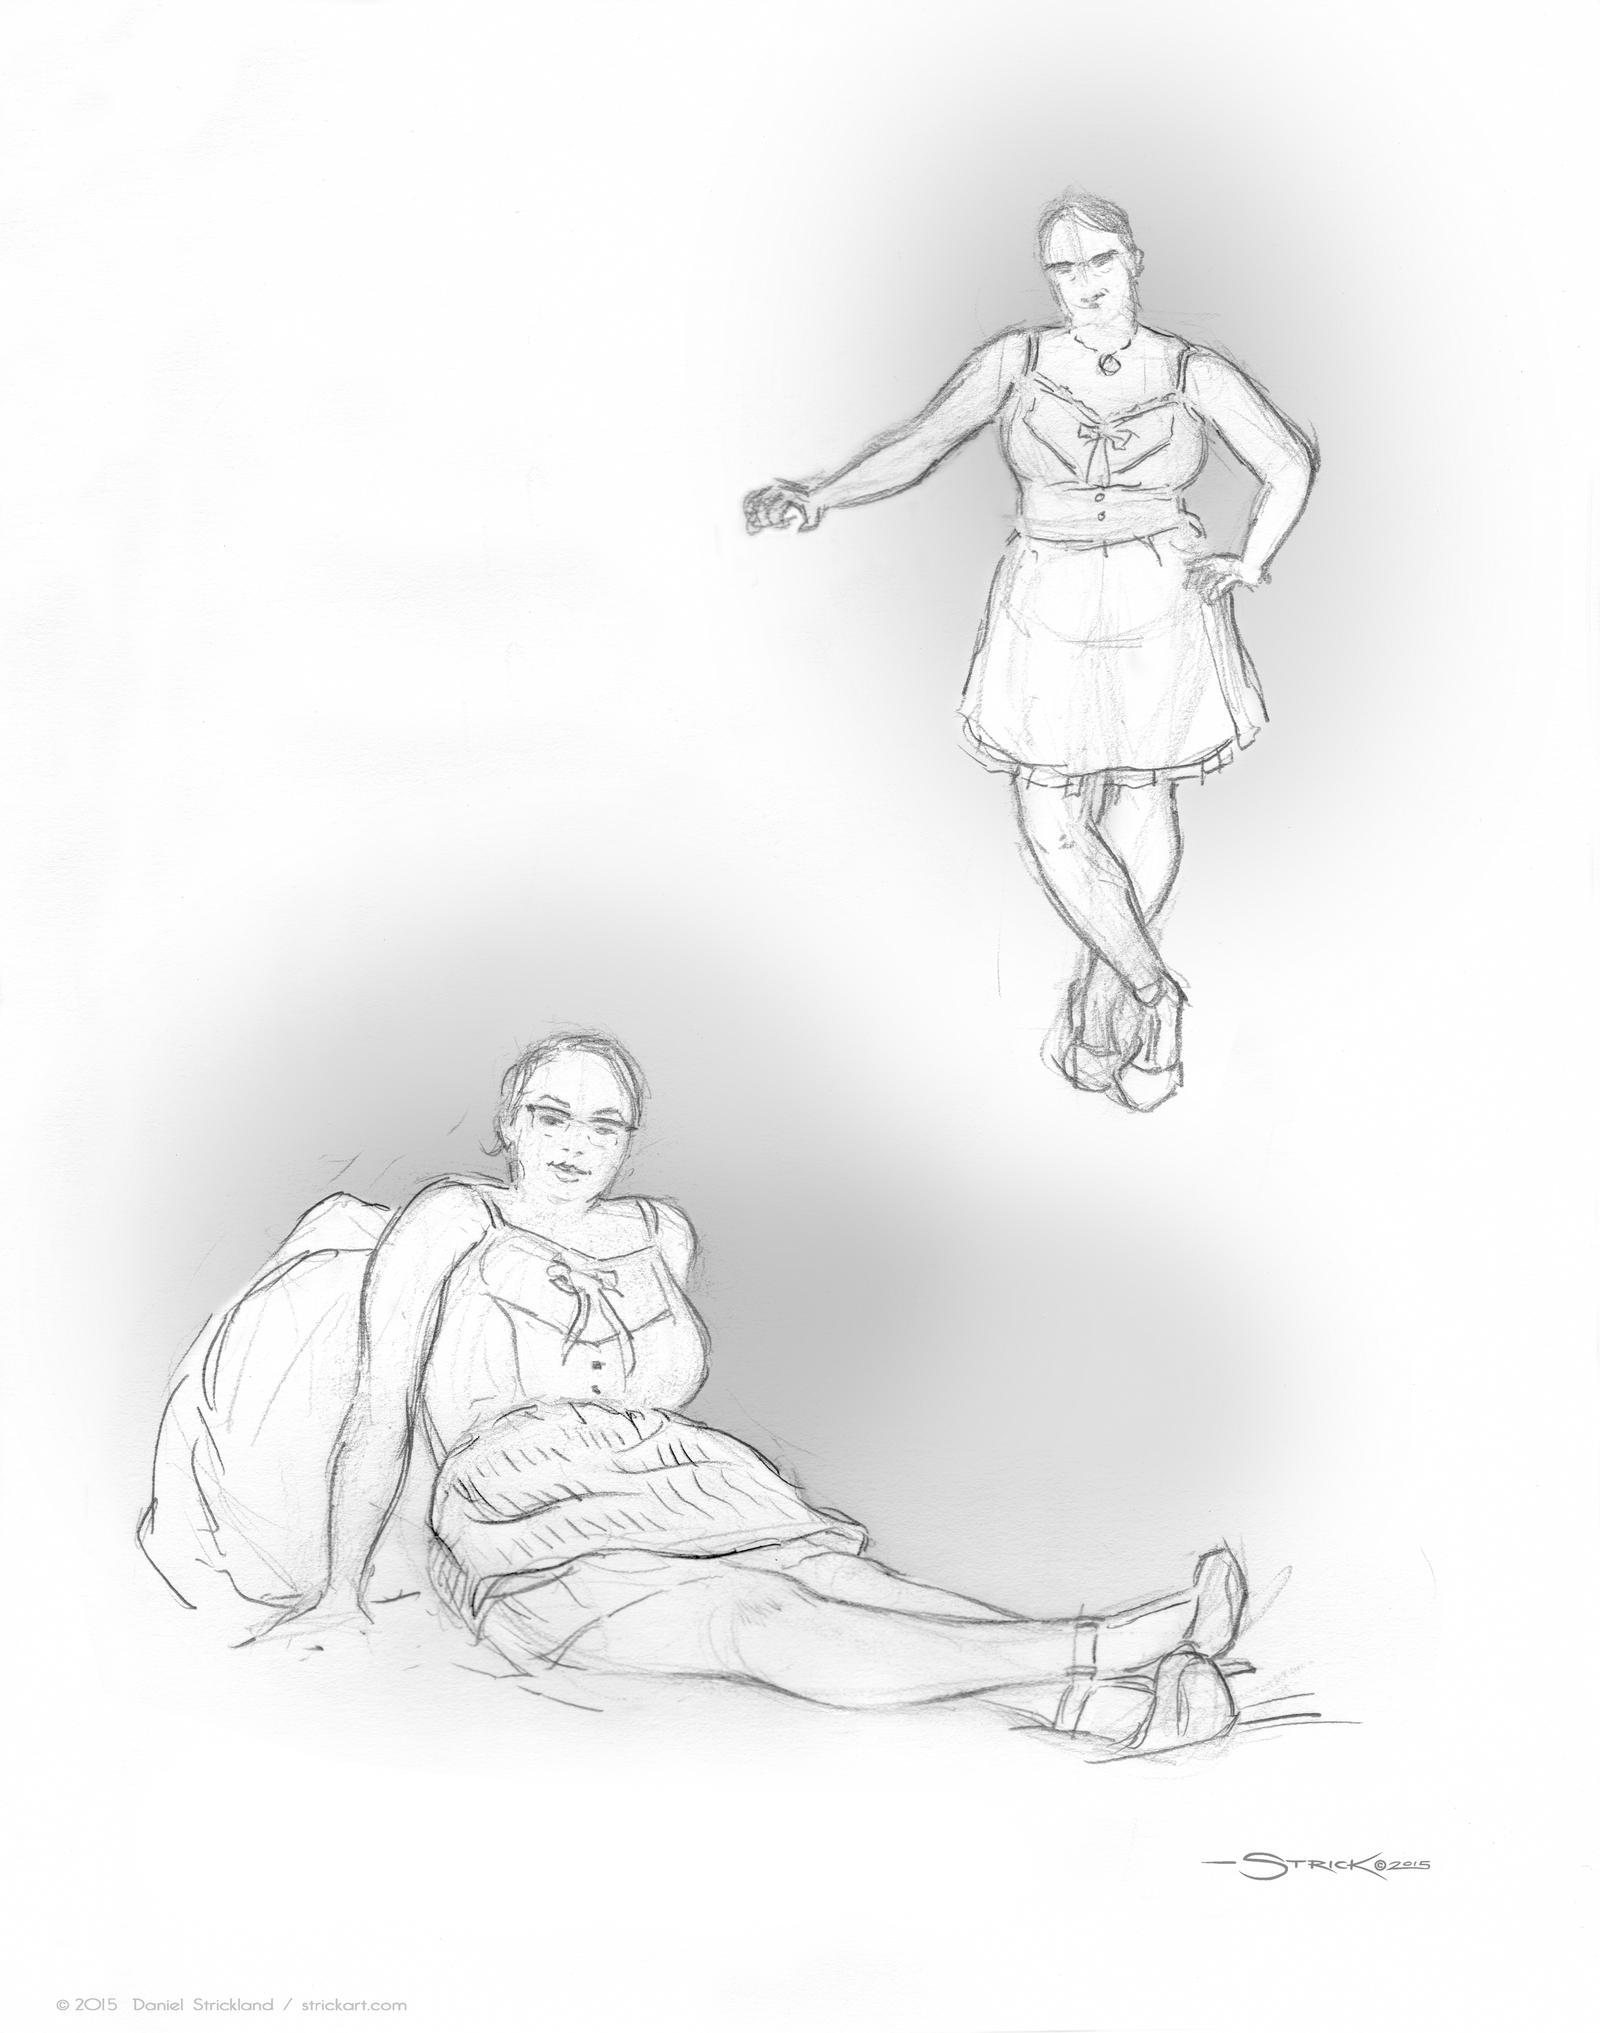 Jenn sketch by strickart